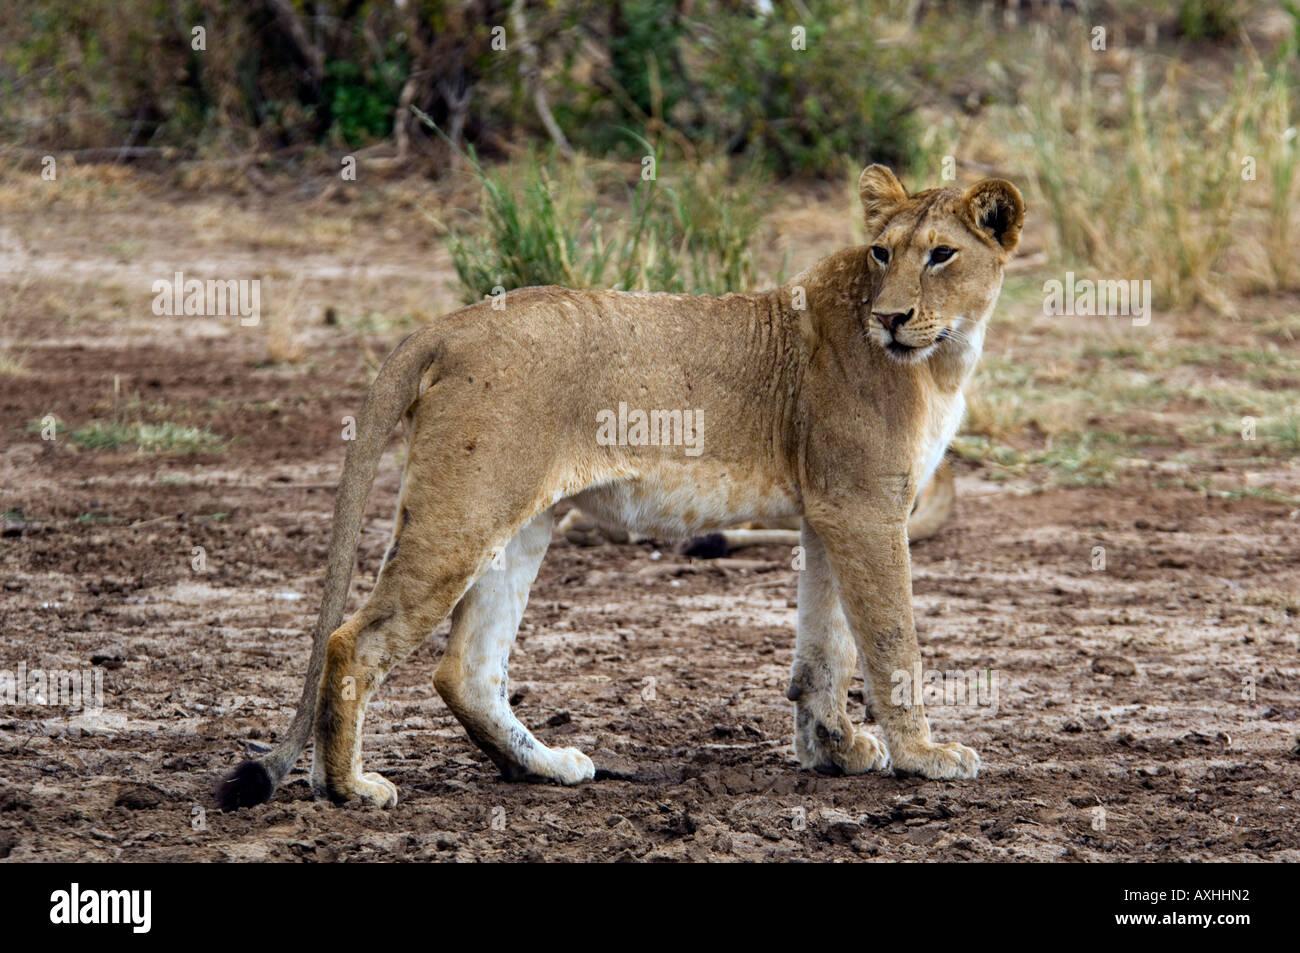 Tanzania Lake Manyara National Park lion panthera leo - Stock Image